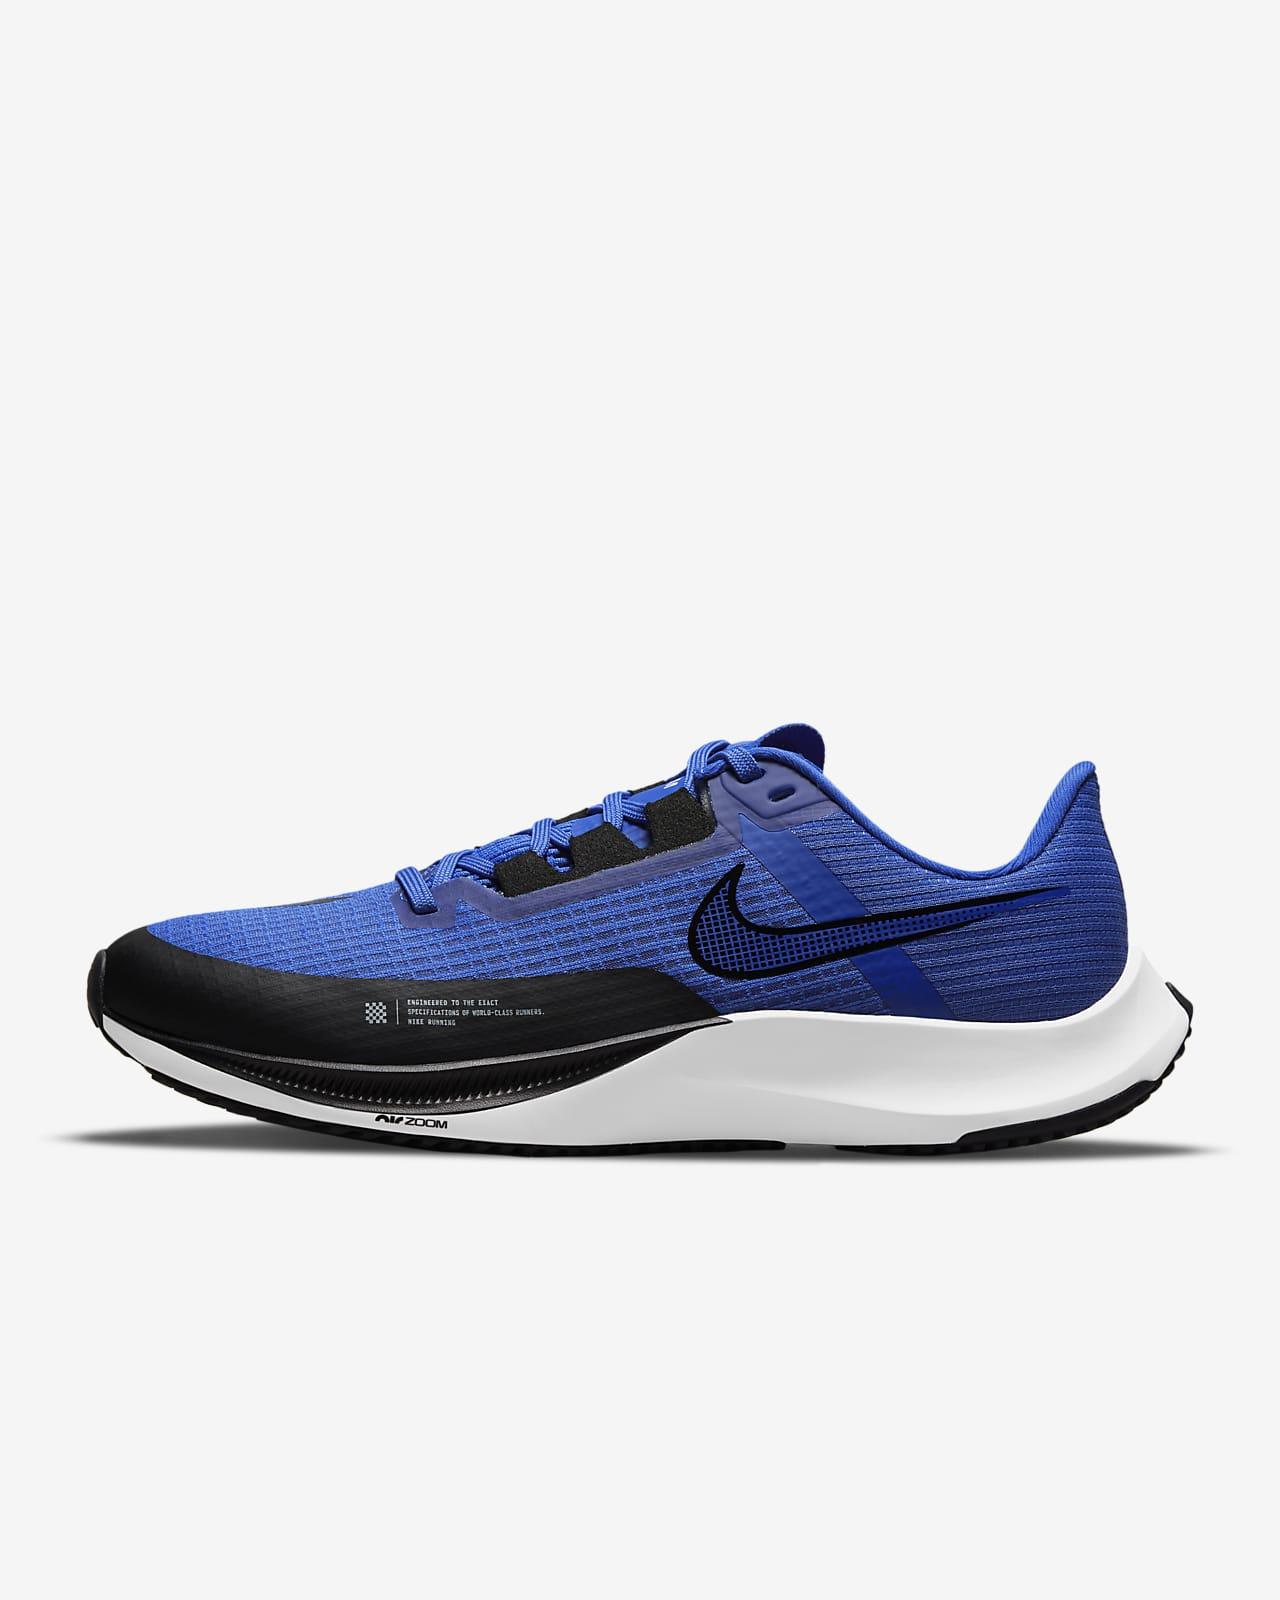 Nike Air Zoom Rival Fly 3 Men's Racing Shoe